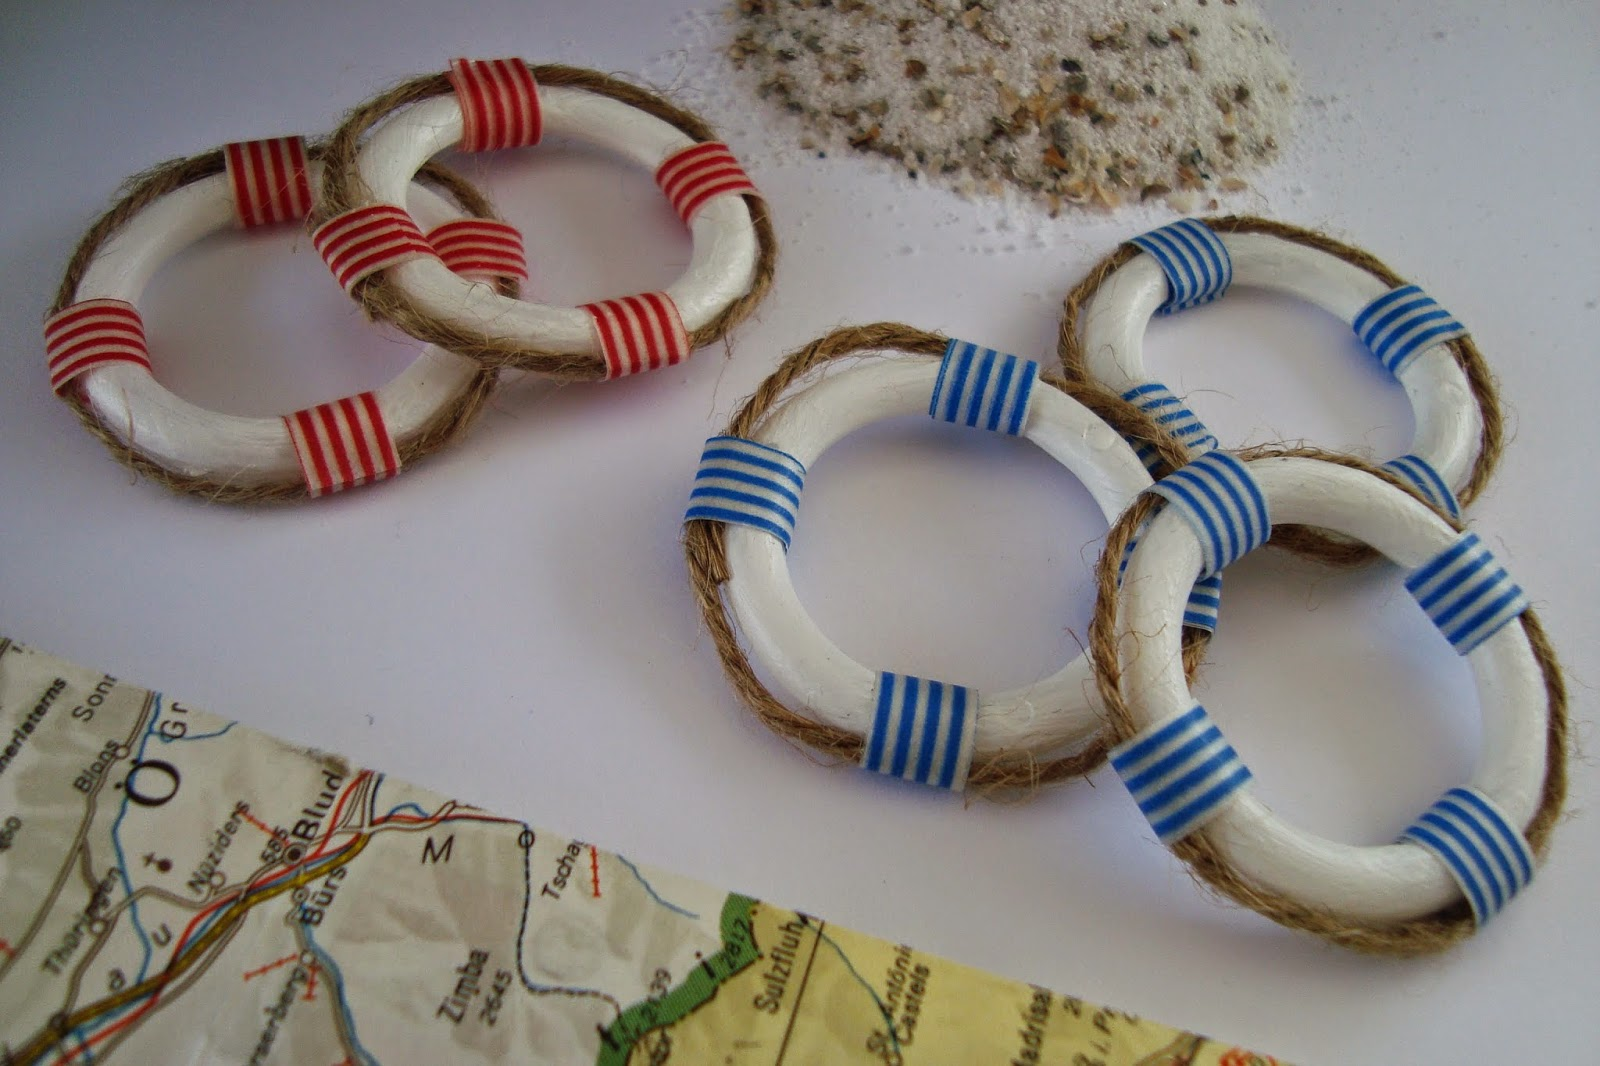 Kleefalter diy deko rettungsringe sommerdeko teil 1 - Dekoration maritim ...